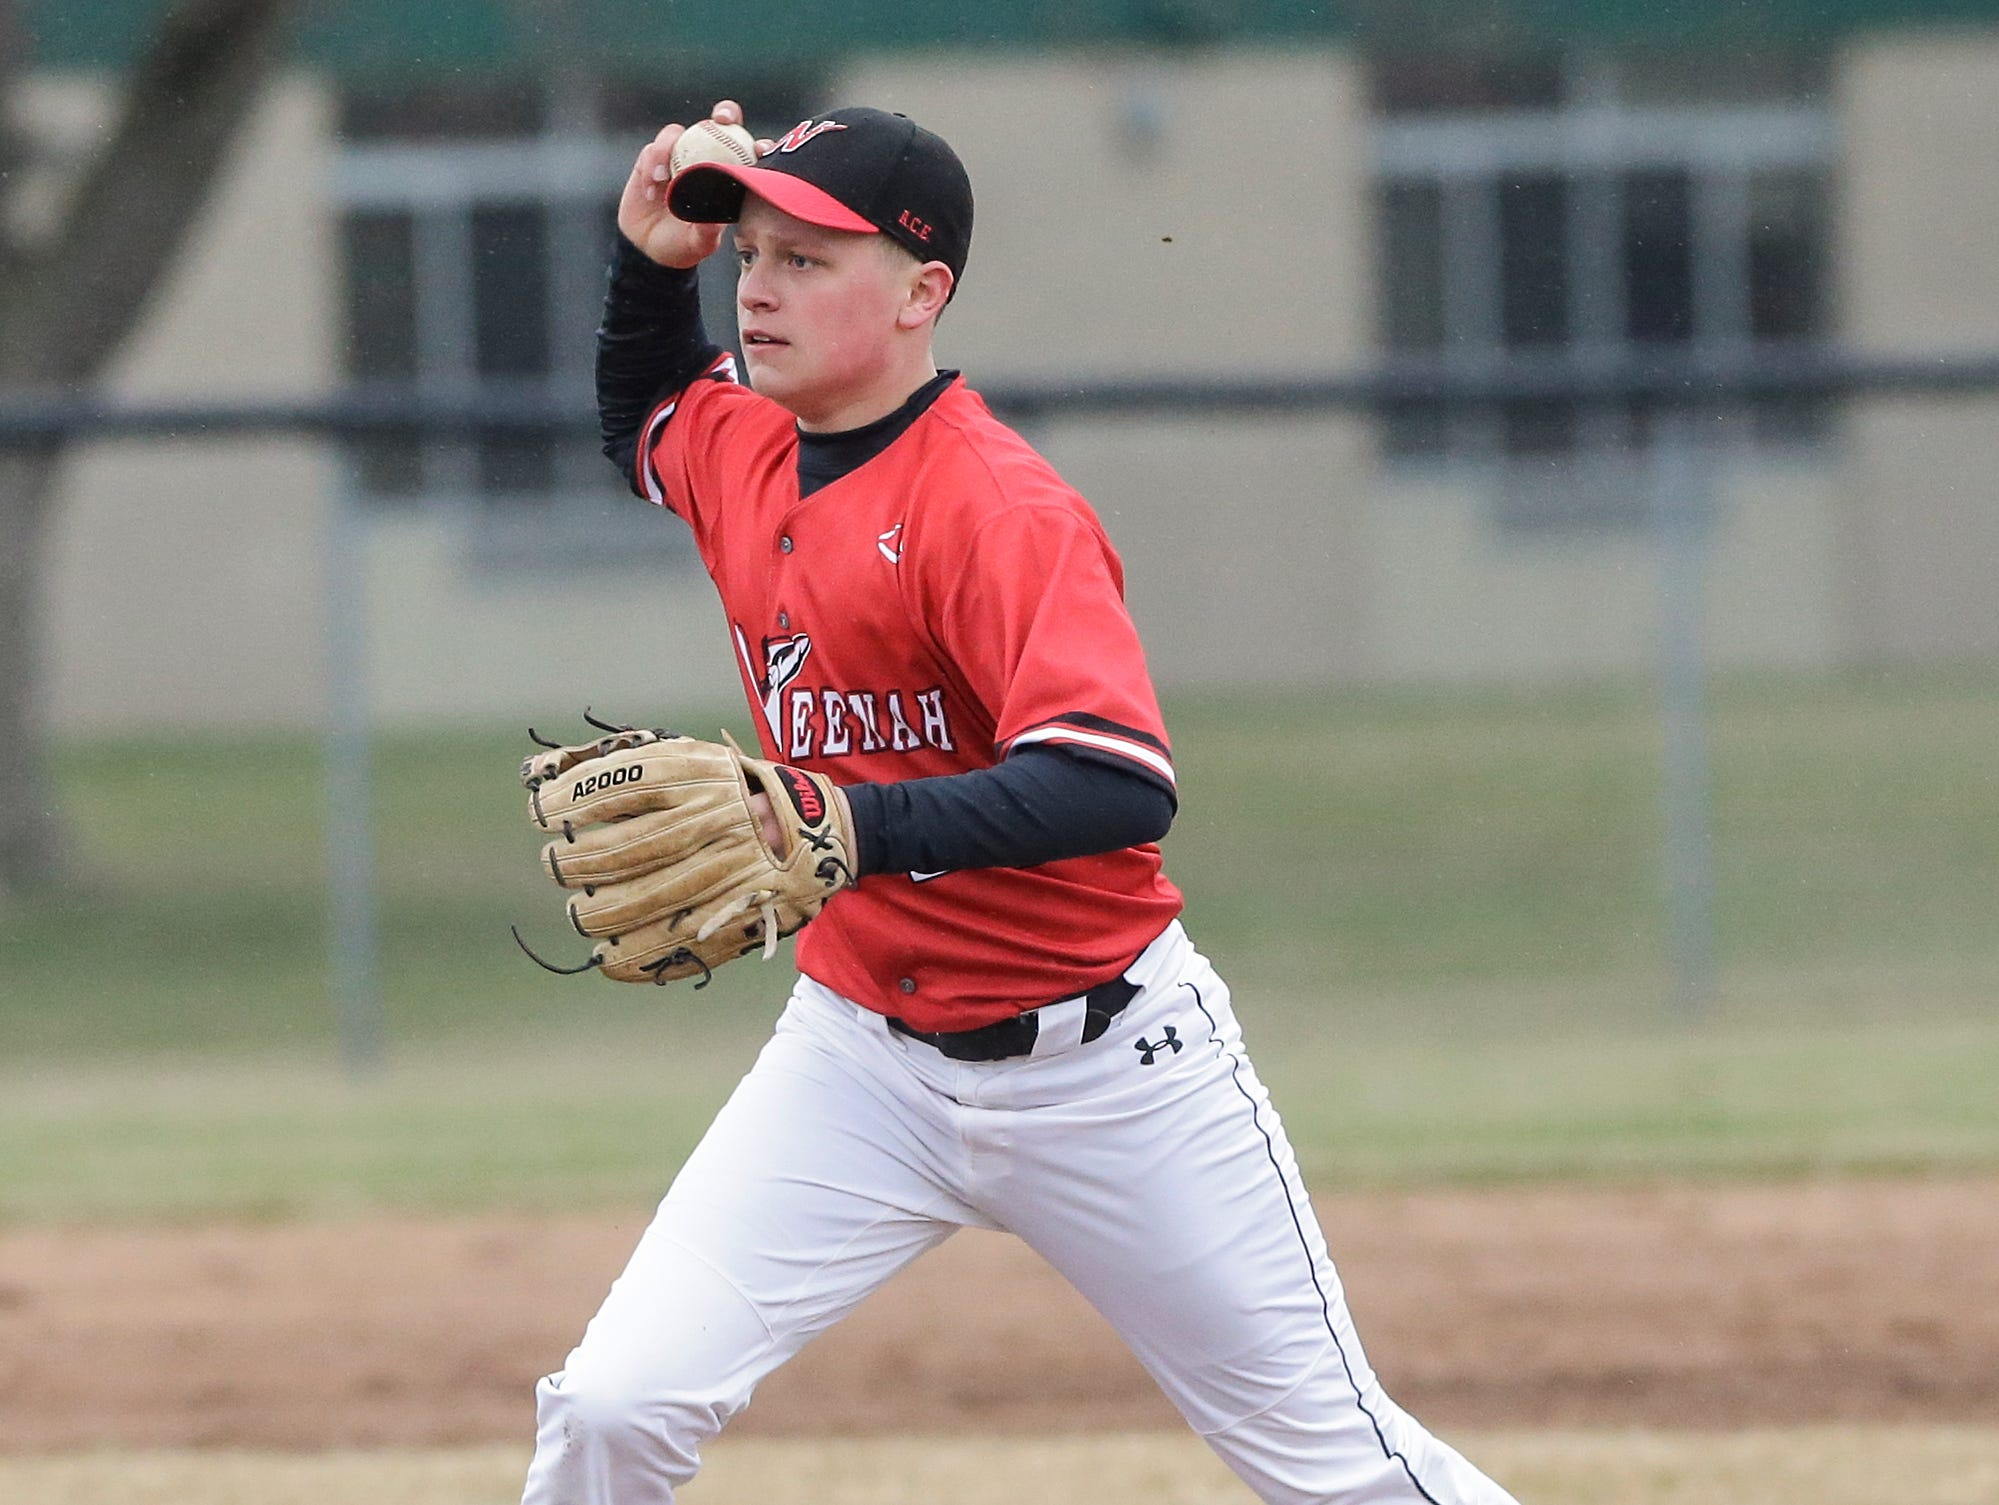 Neenah High School baseball's Chase Hanselman fields a ground ball against Fond du Lac High School during their game Thursday, April 18, 2019 in Fond du Lac, Wis. Doug Raflik/USA TODAY NETWORK-Wisconsin